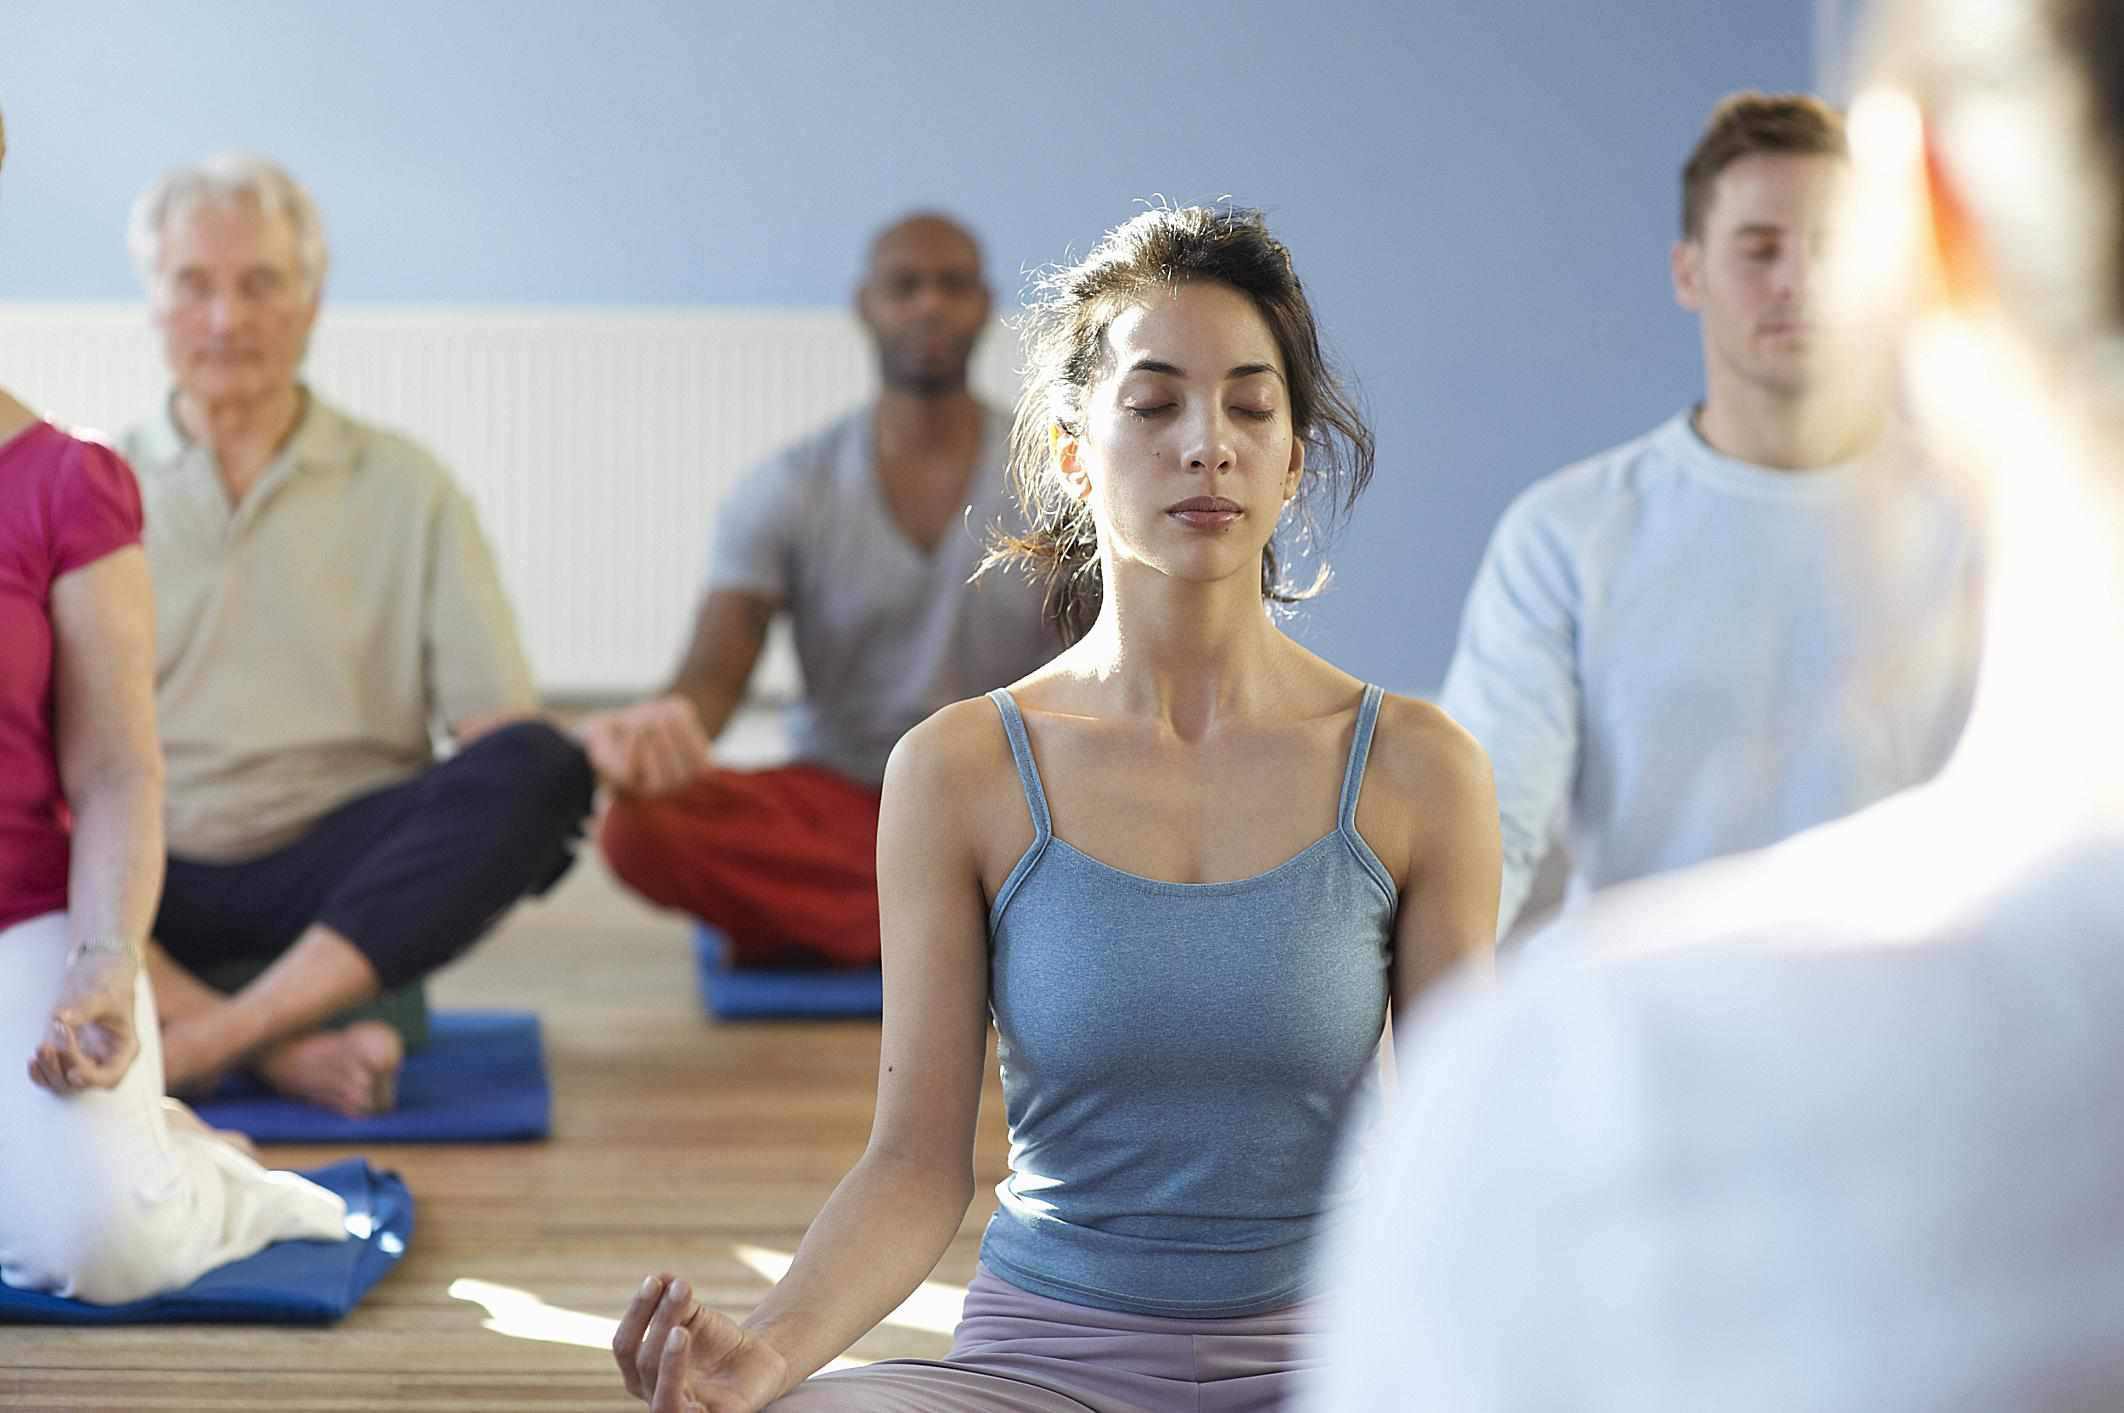 Meet Single Parents at Yoga